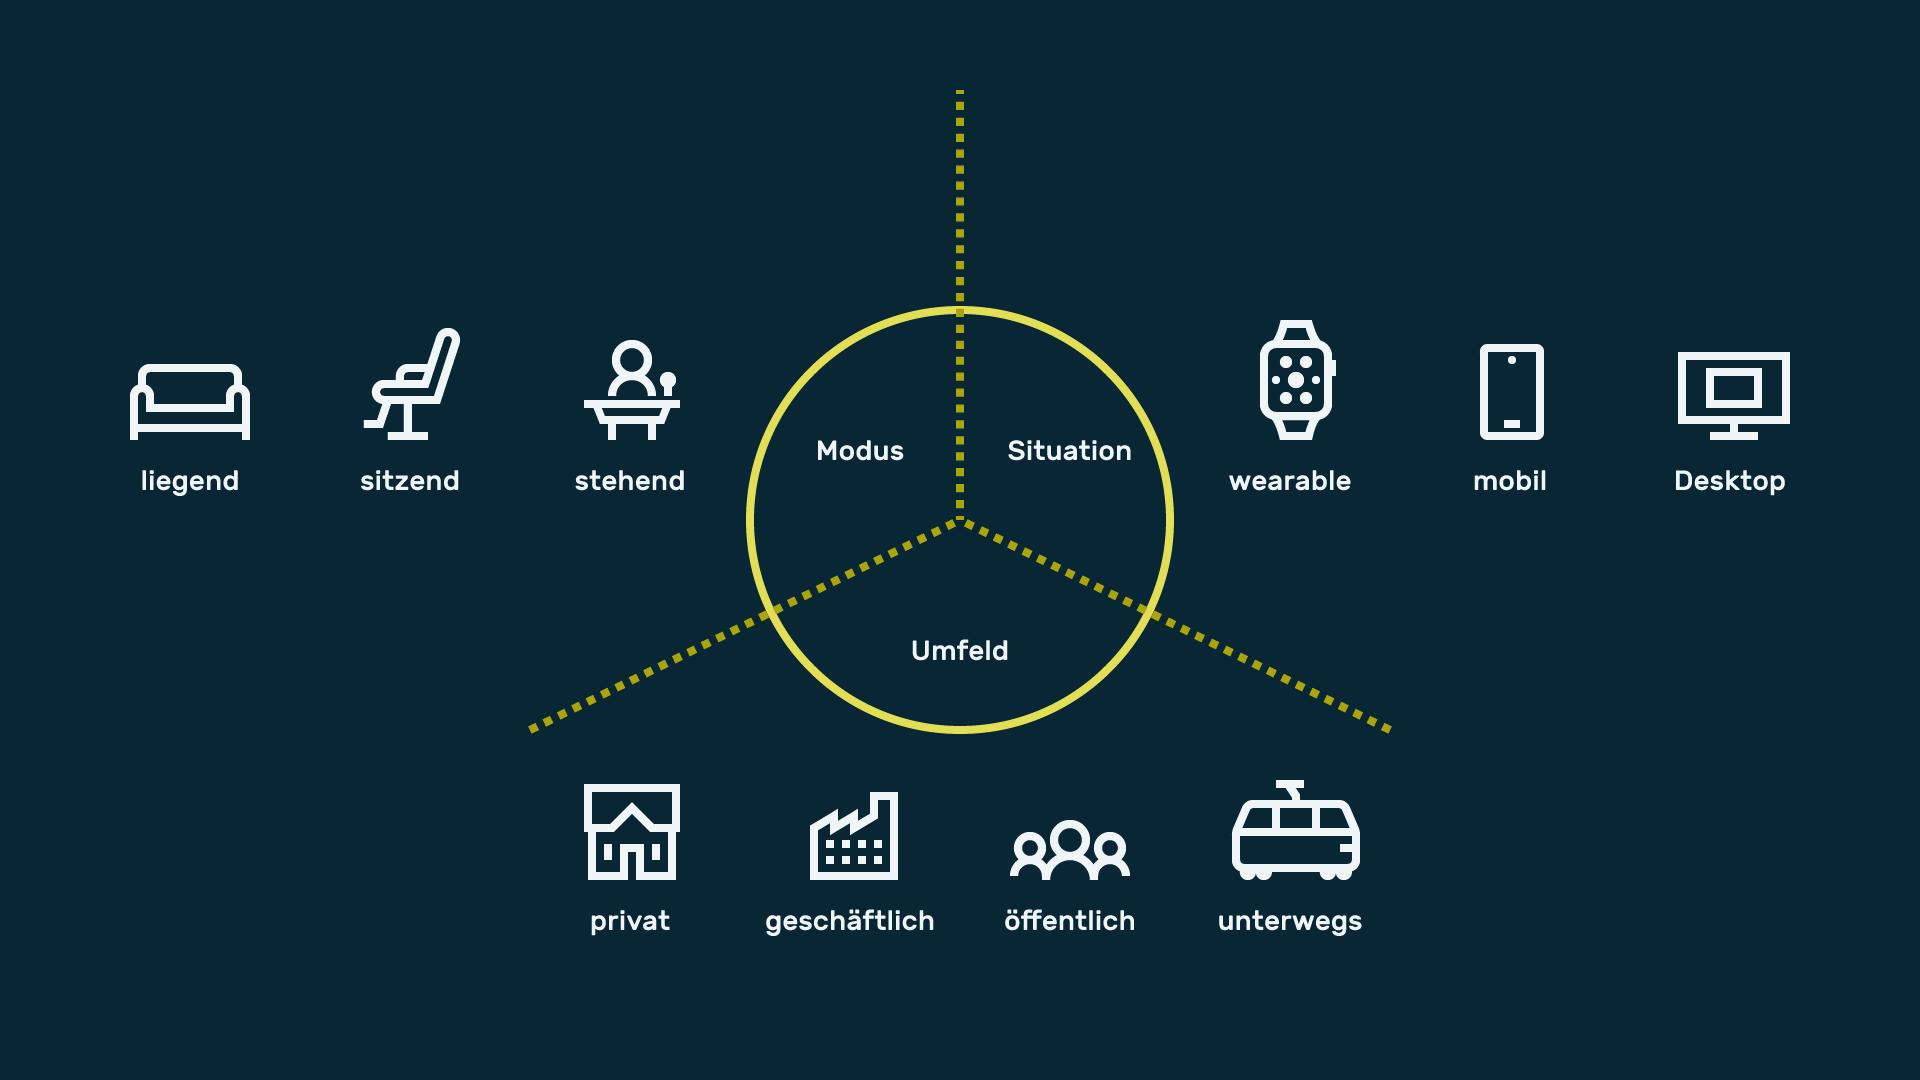 Infografik Userinterfacedesign Nutzungskontext 01